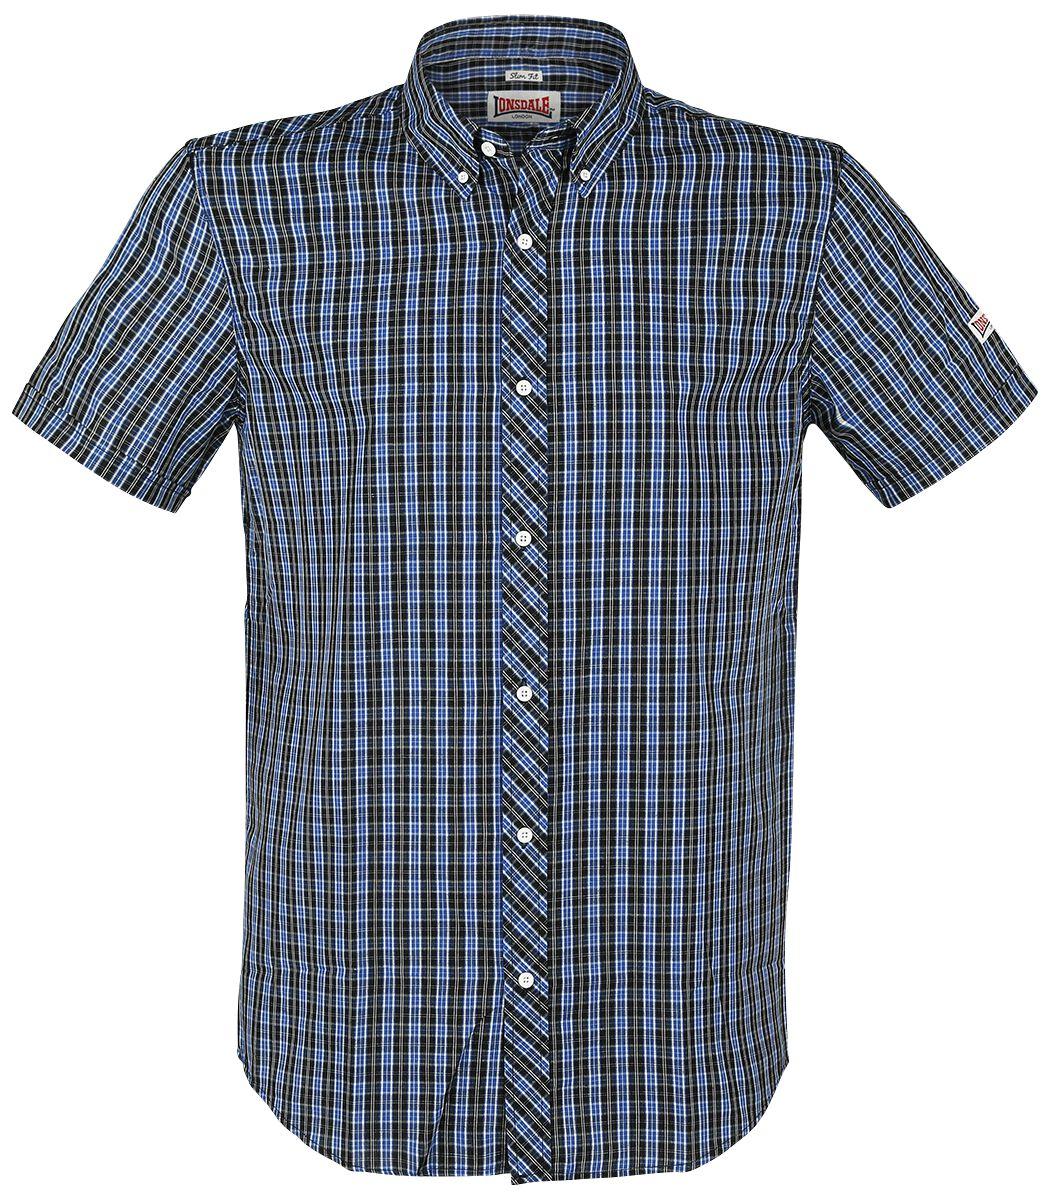 Image of Lonsdale London Brixworth Hemd blau